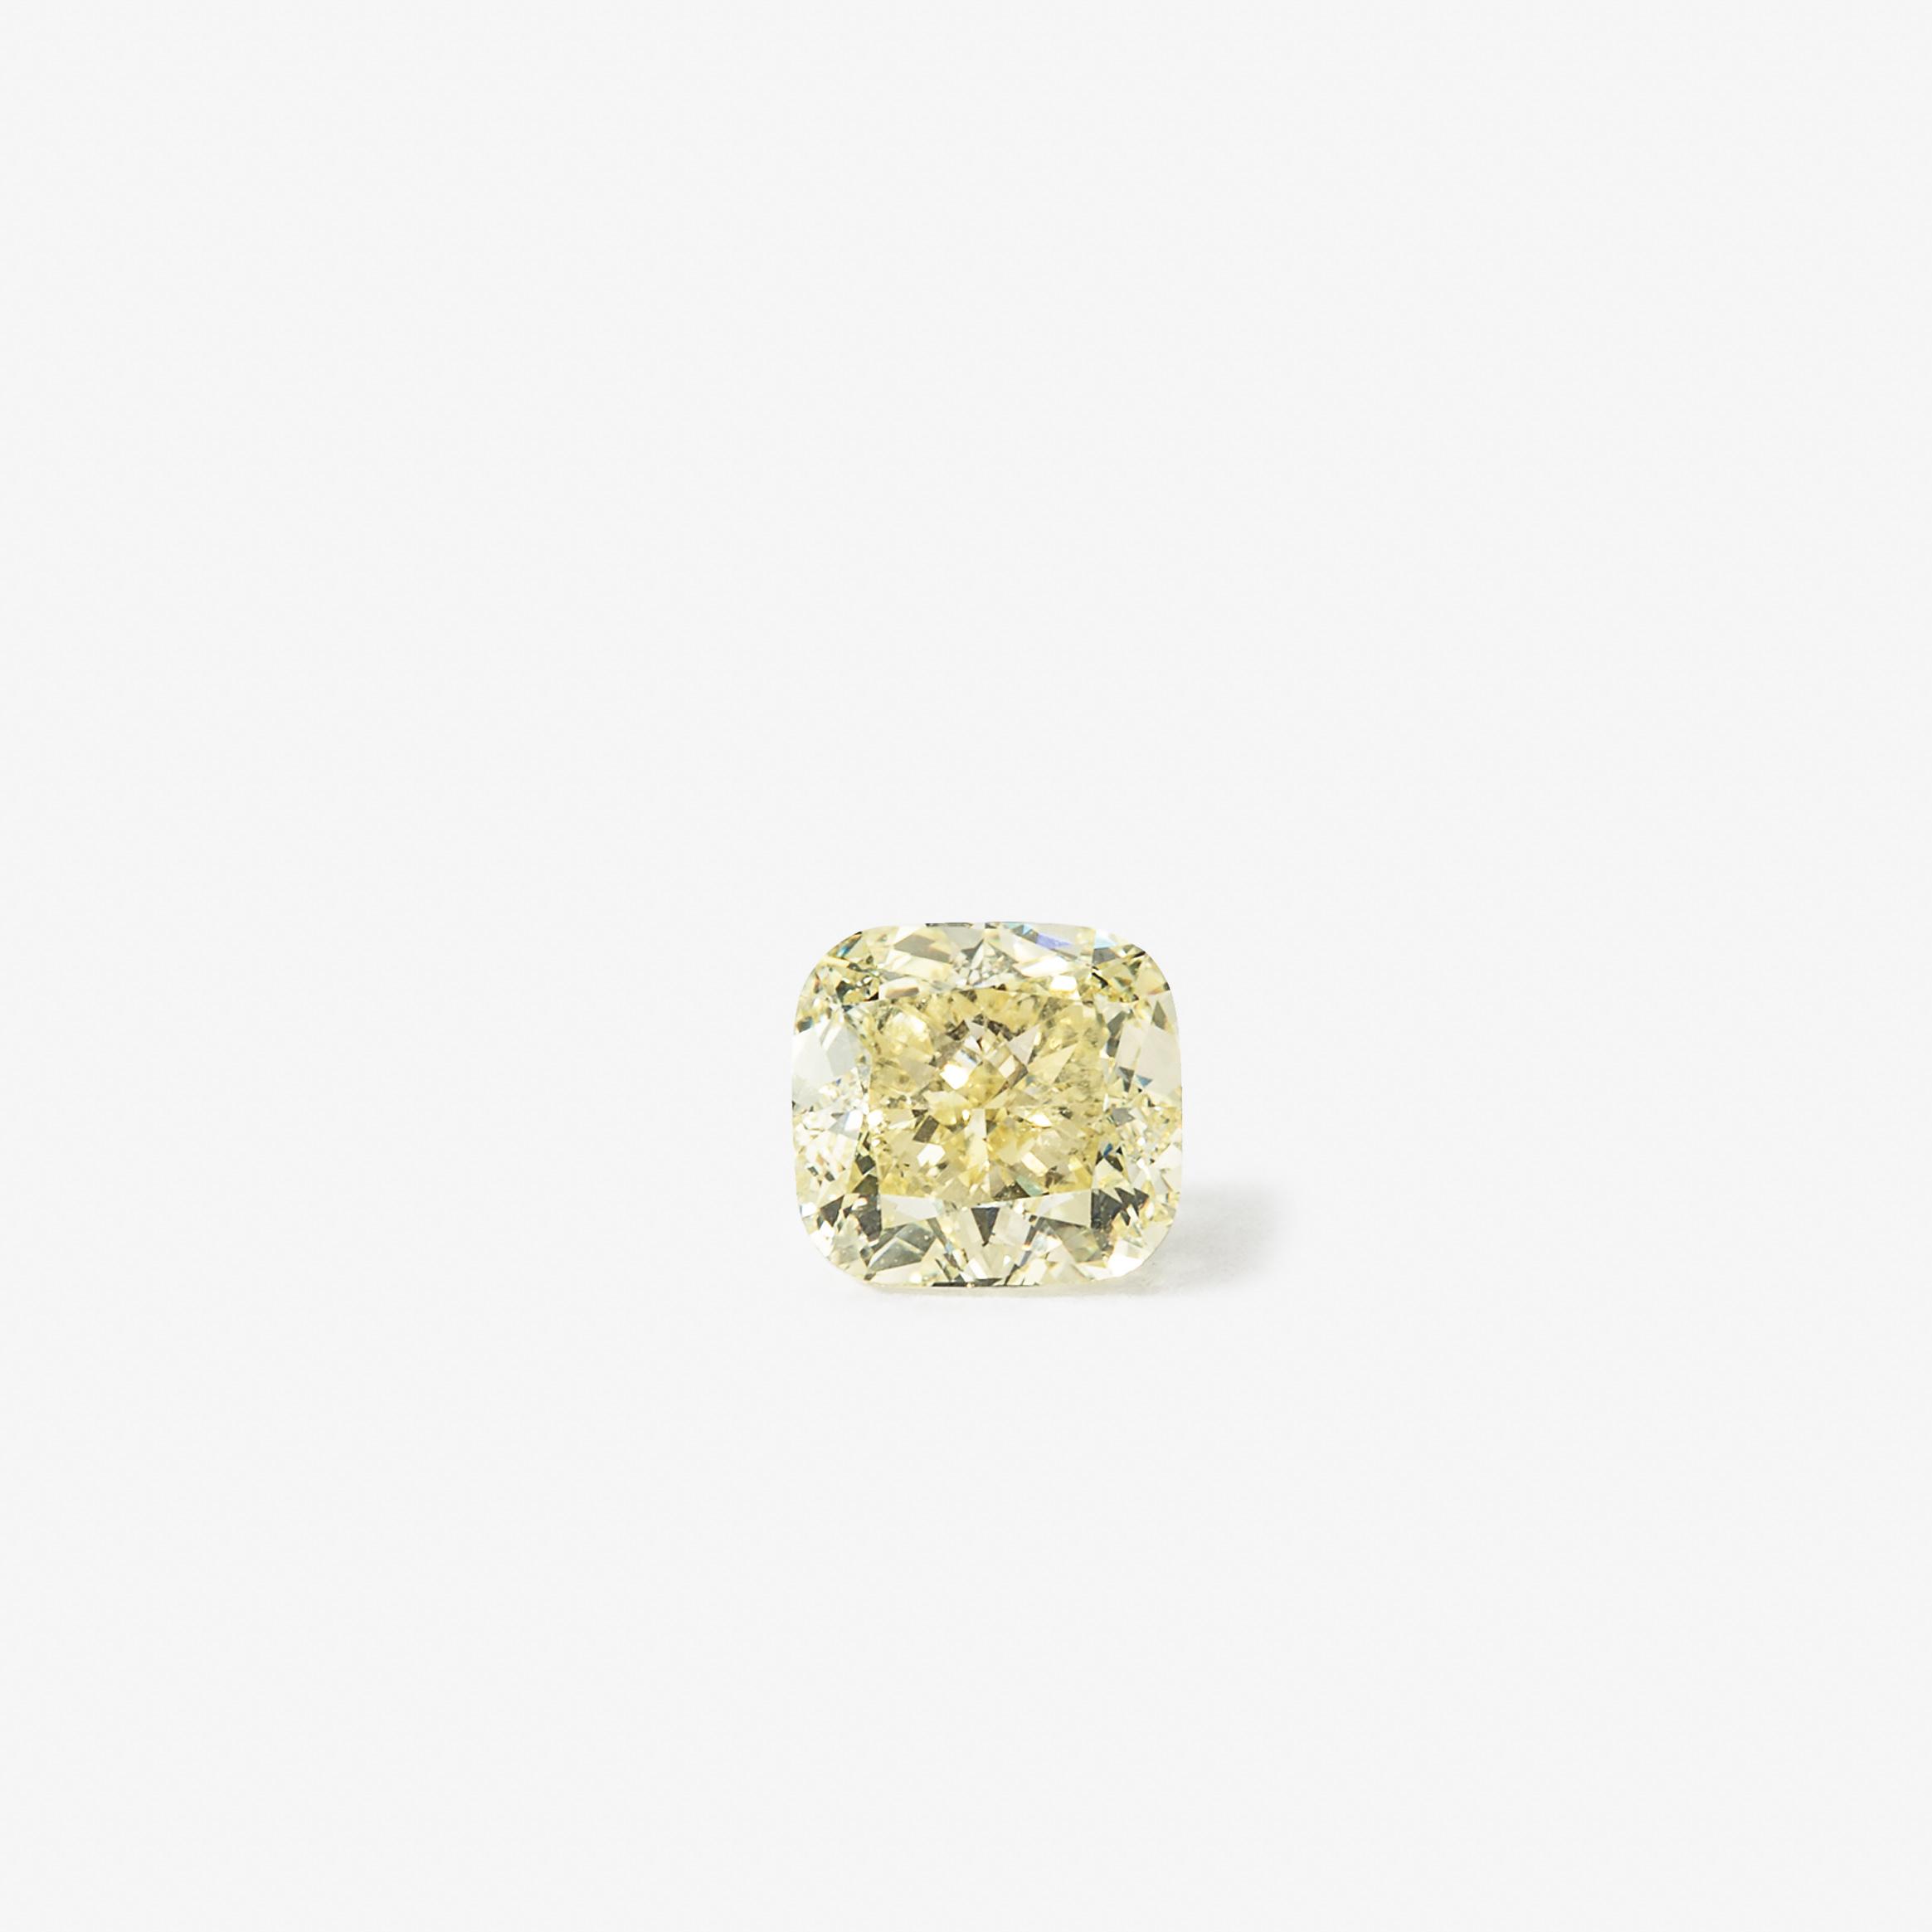 Cushion Cut-Diamant von 1,36 ct GIA-Zertifikat: Fancy Light Yellow, Natural Even, IF, numbered GIA 6202884809, 5. November 2015 Schätzpreis: 9.000-12.000 Euro